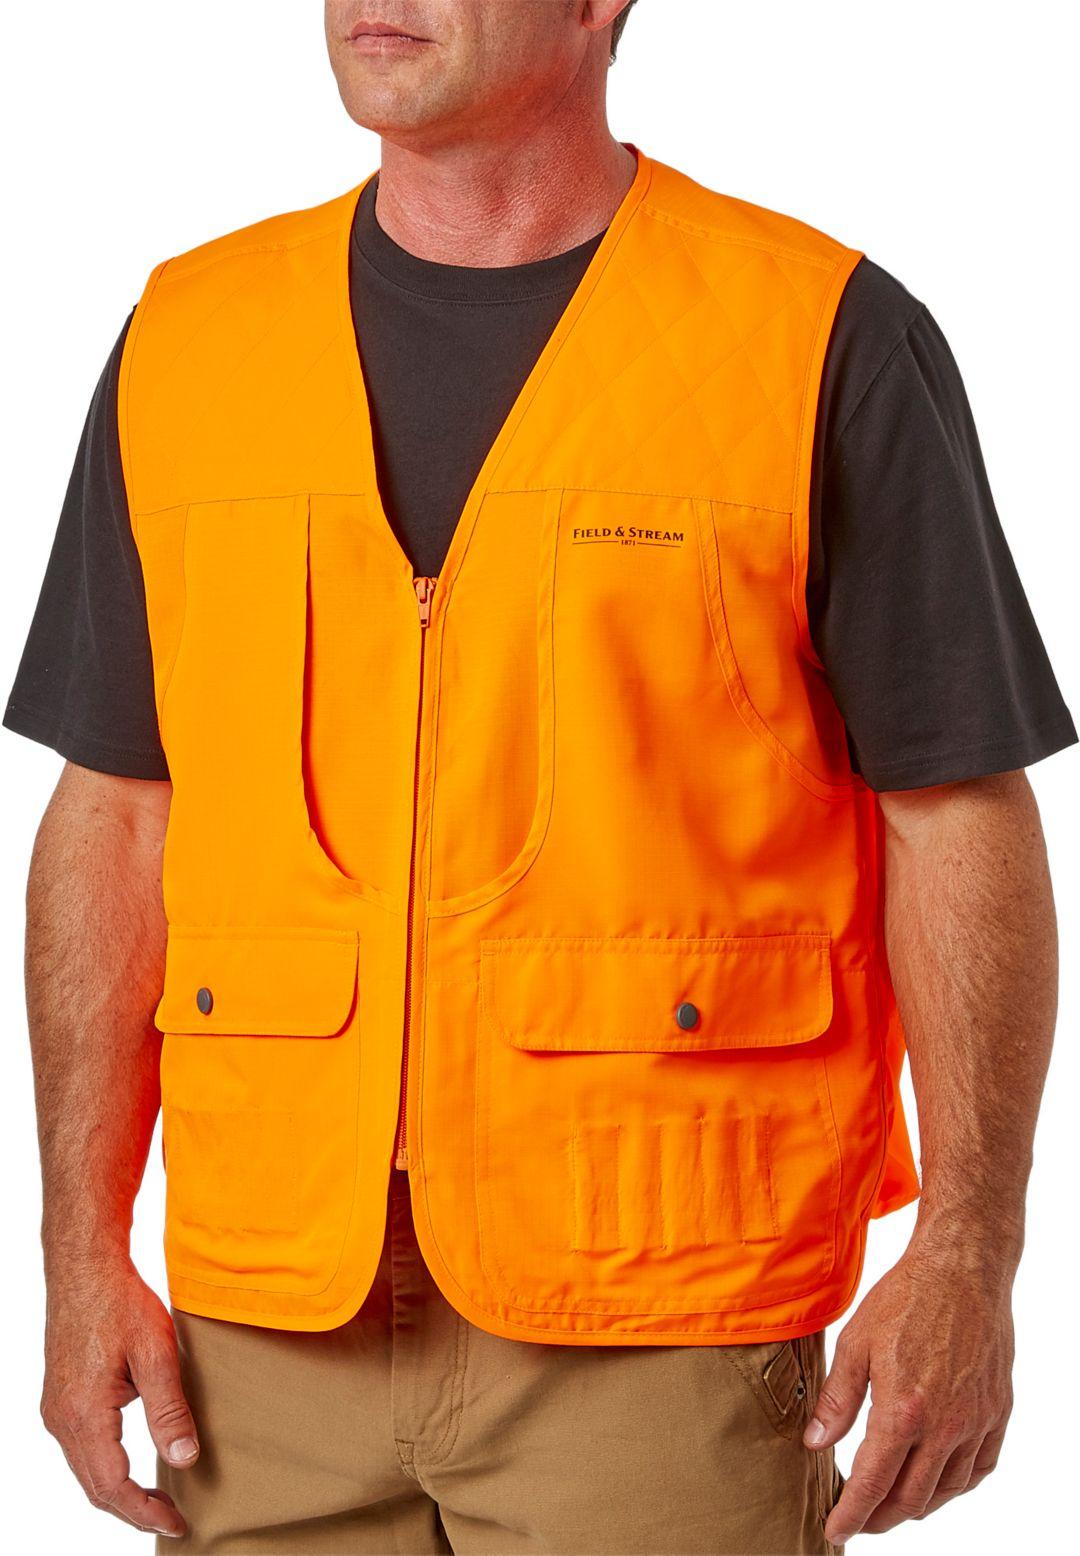 4b9e6c279d847 Field & Stream Men's Blaze Orange Front Loader Hunting Vest | DICK'S ...